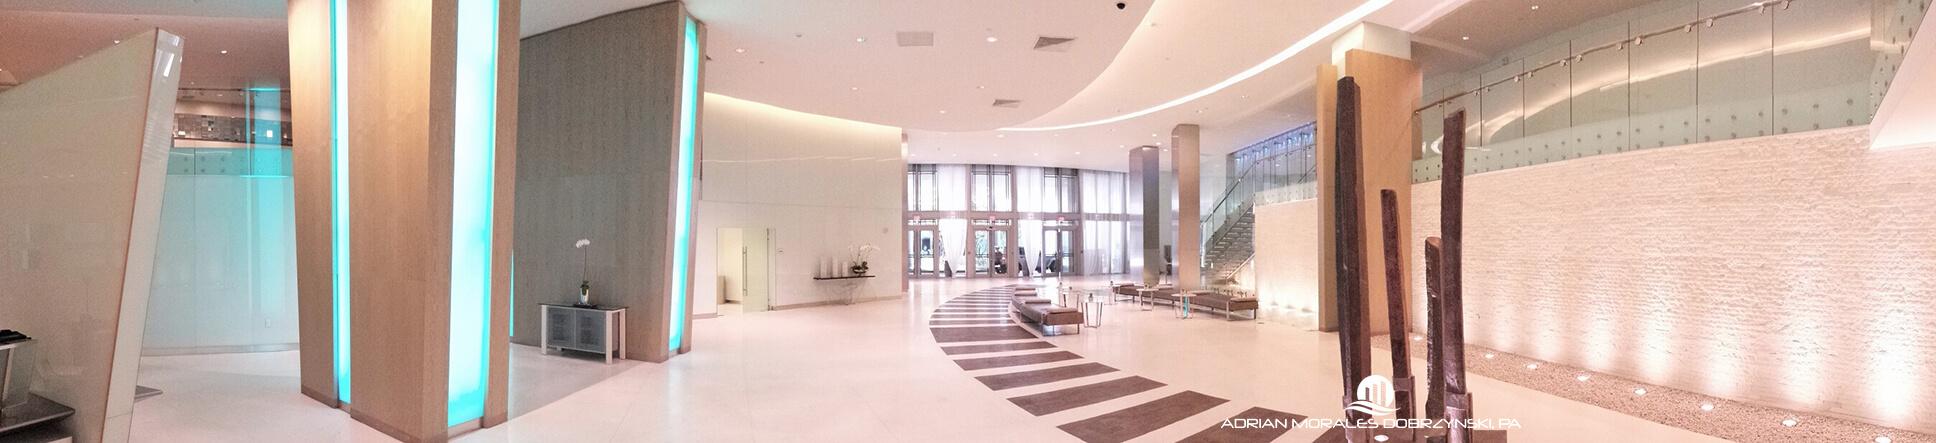 MINT-lobby-panorama1-ENHANCEDFINALCROP-2696px-panda-copy-logo